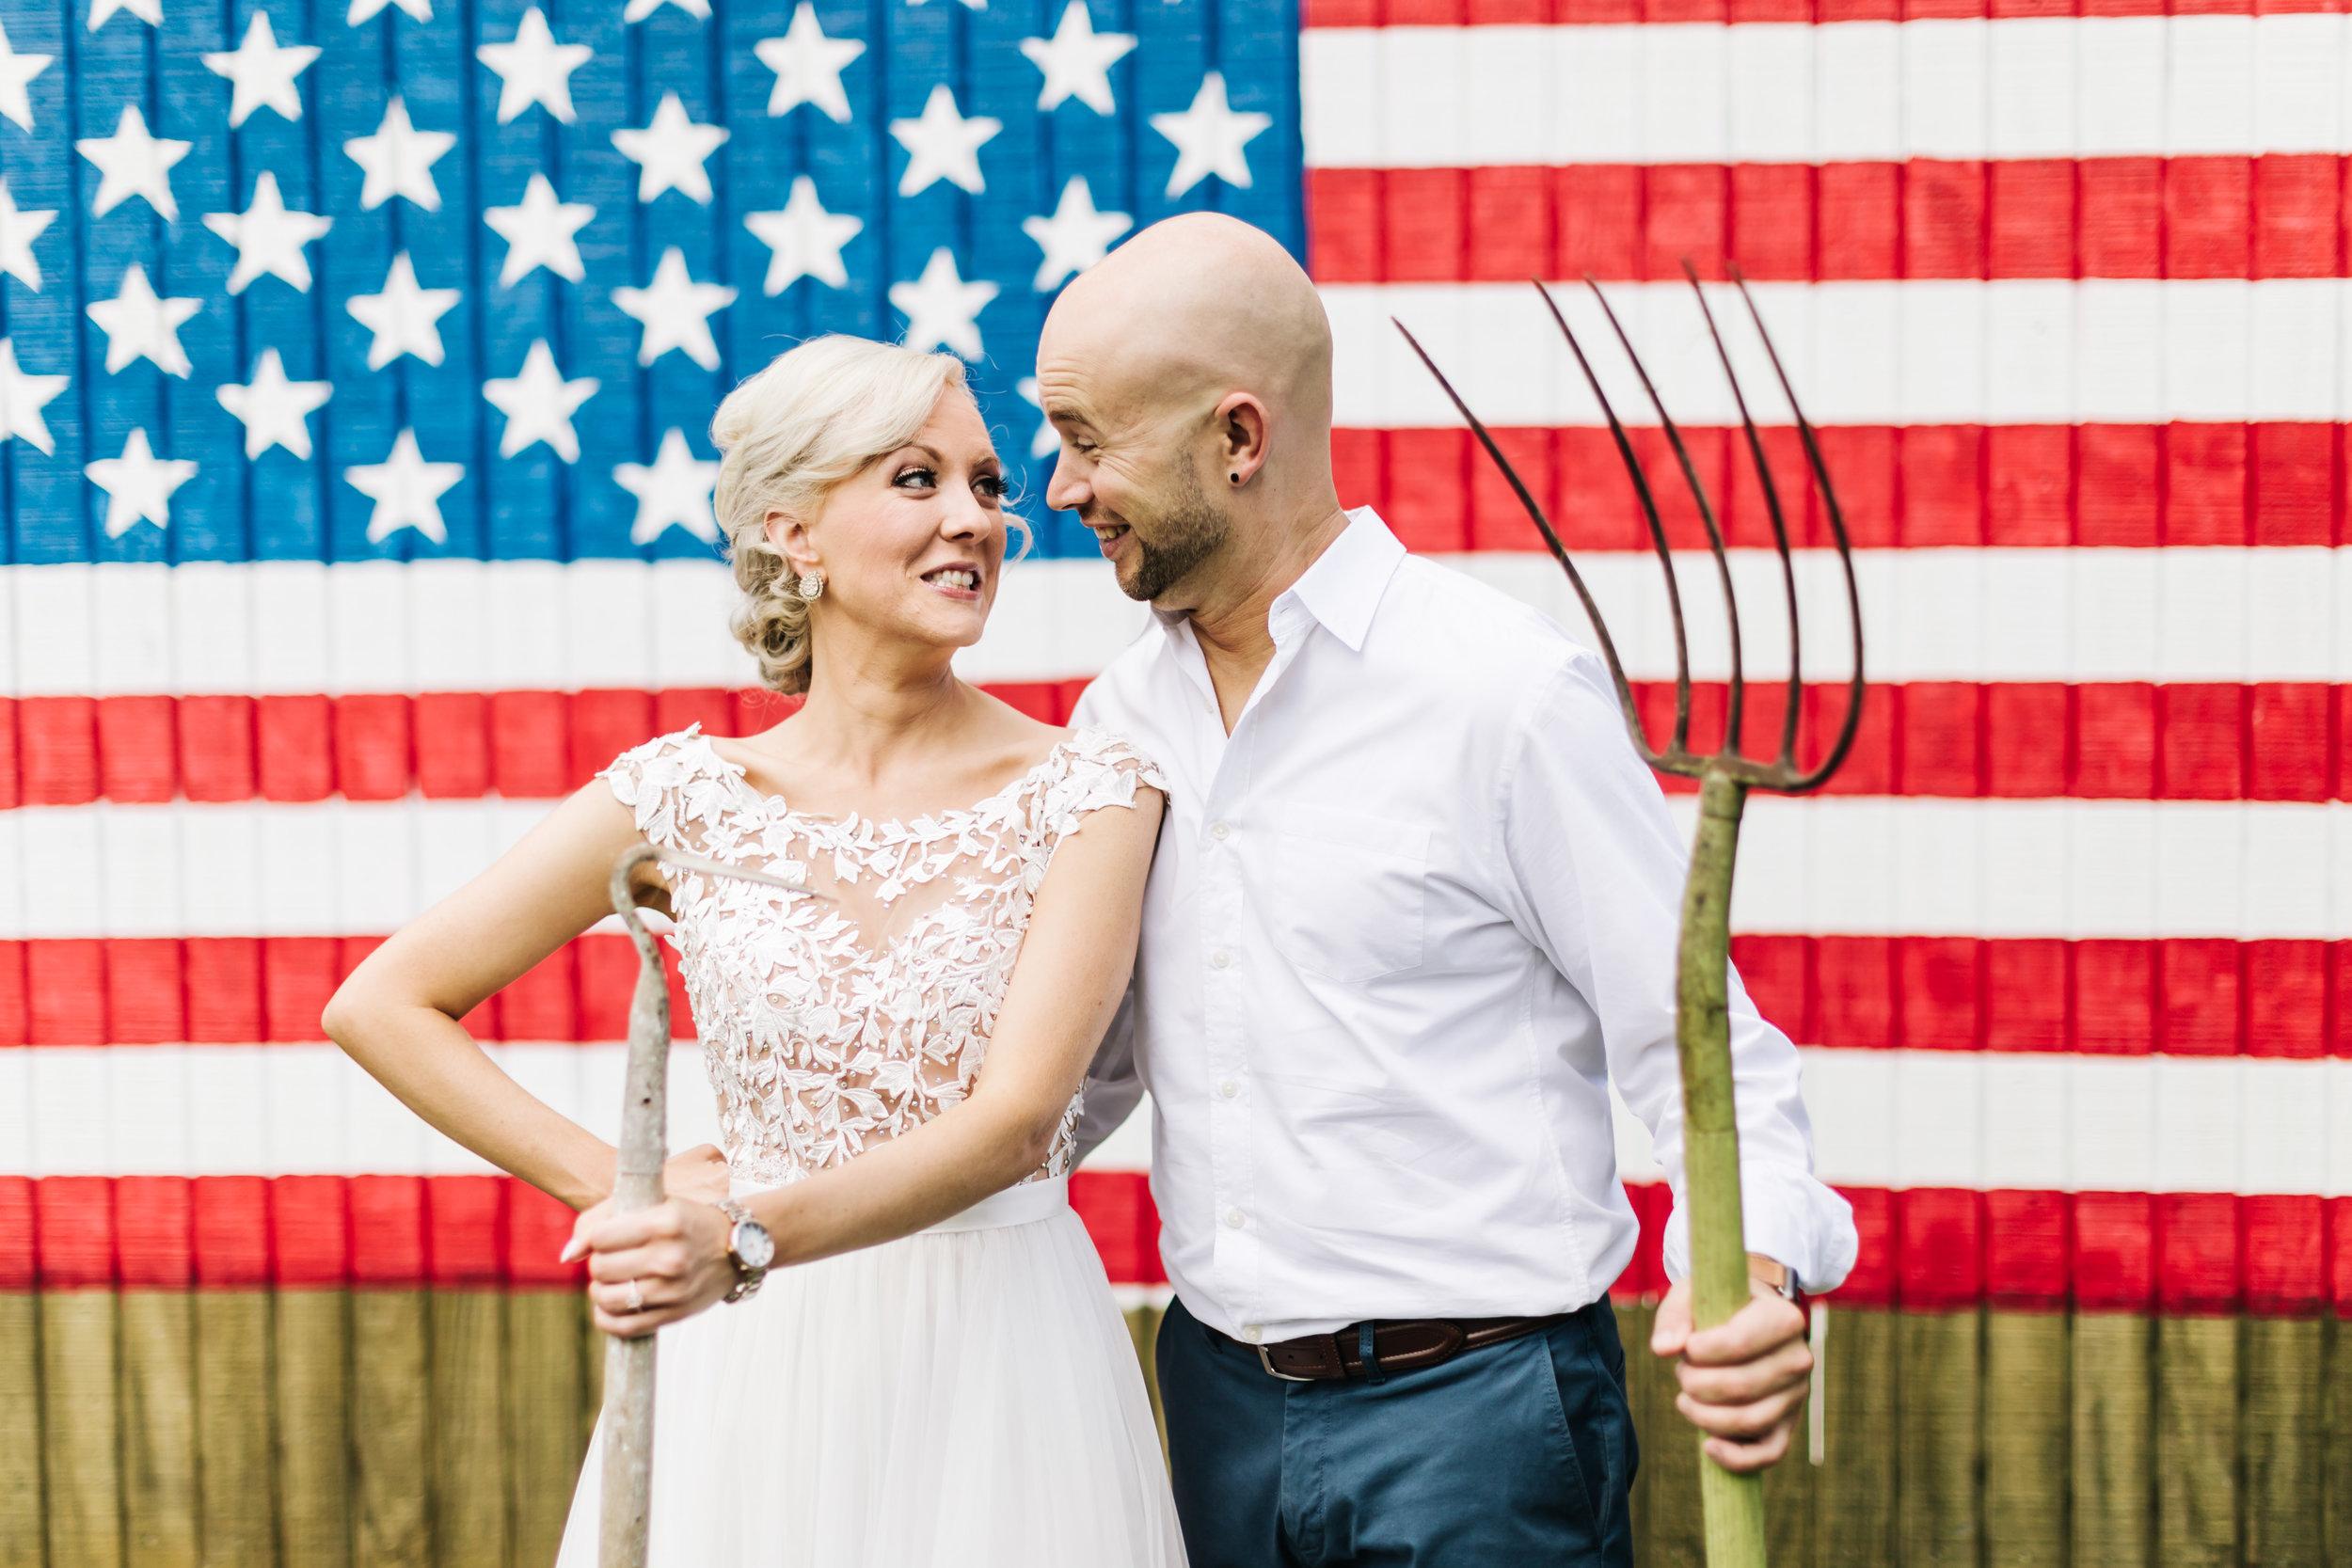 2018.09.02 Ray and Sarah Prizner Nashville TN Wedding FINALS-189.jpg